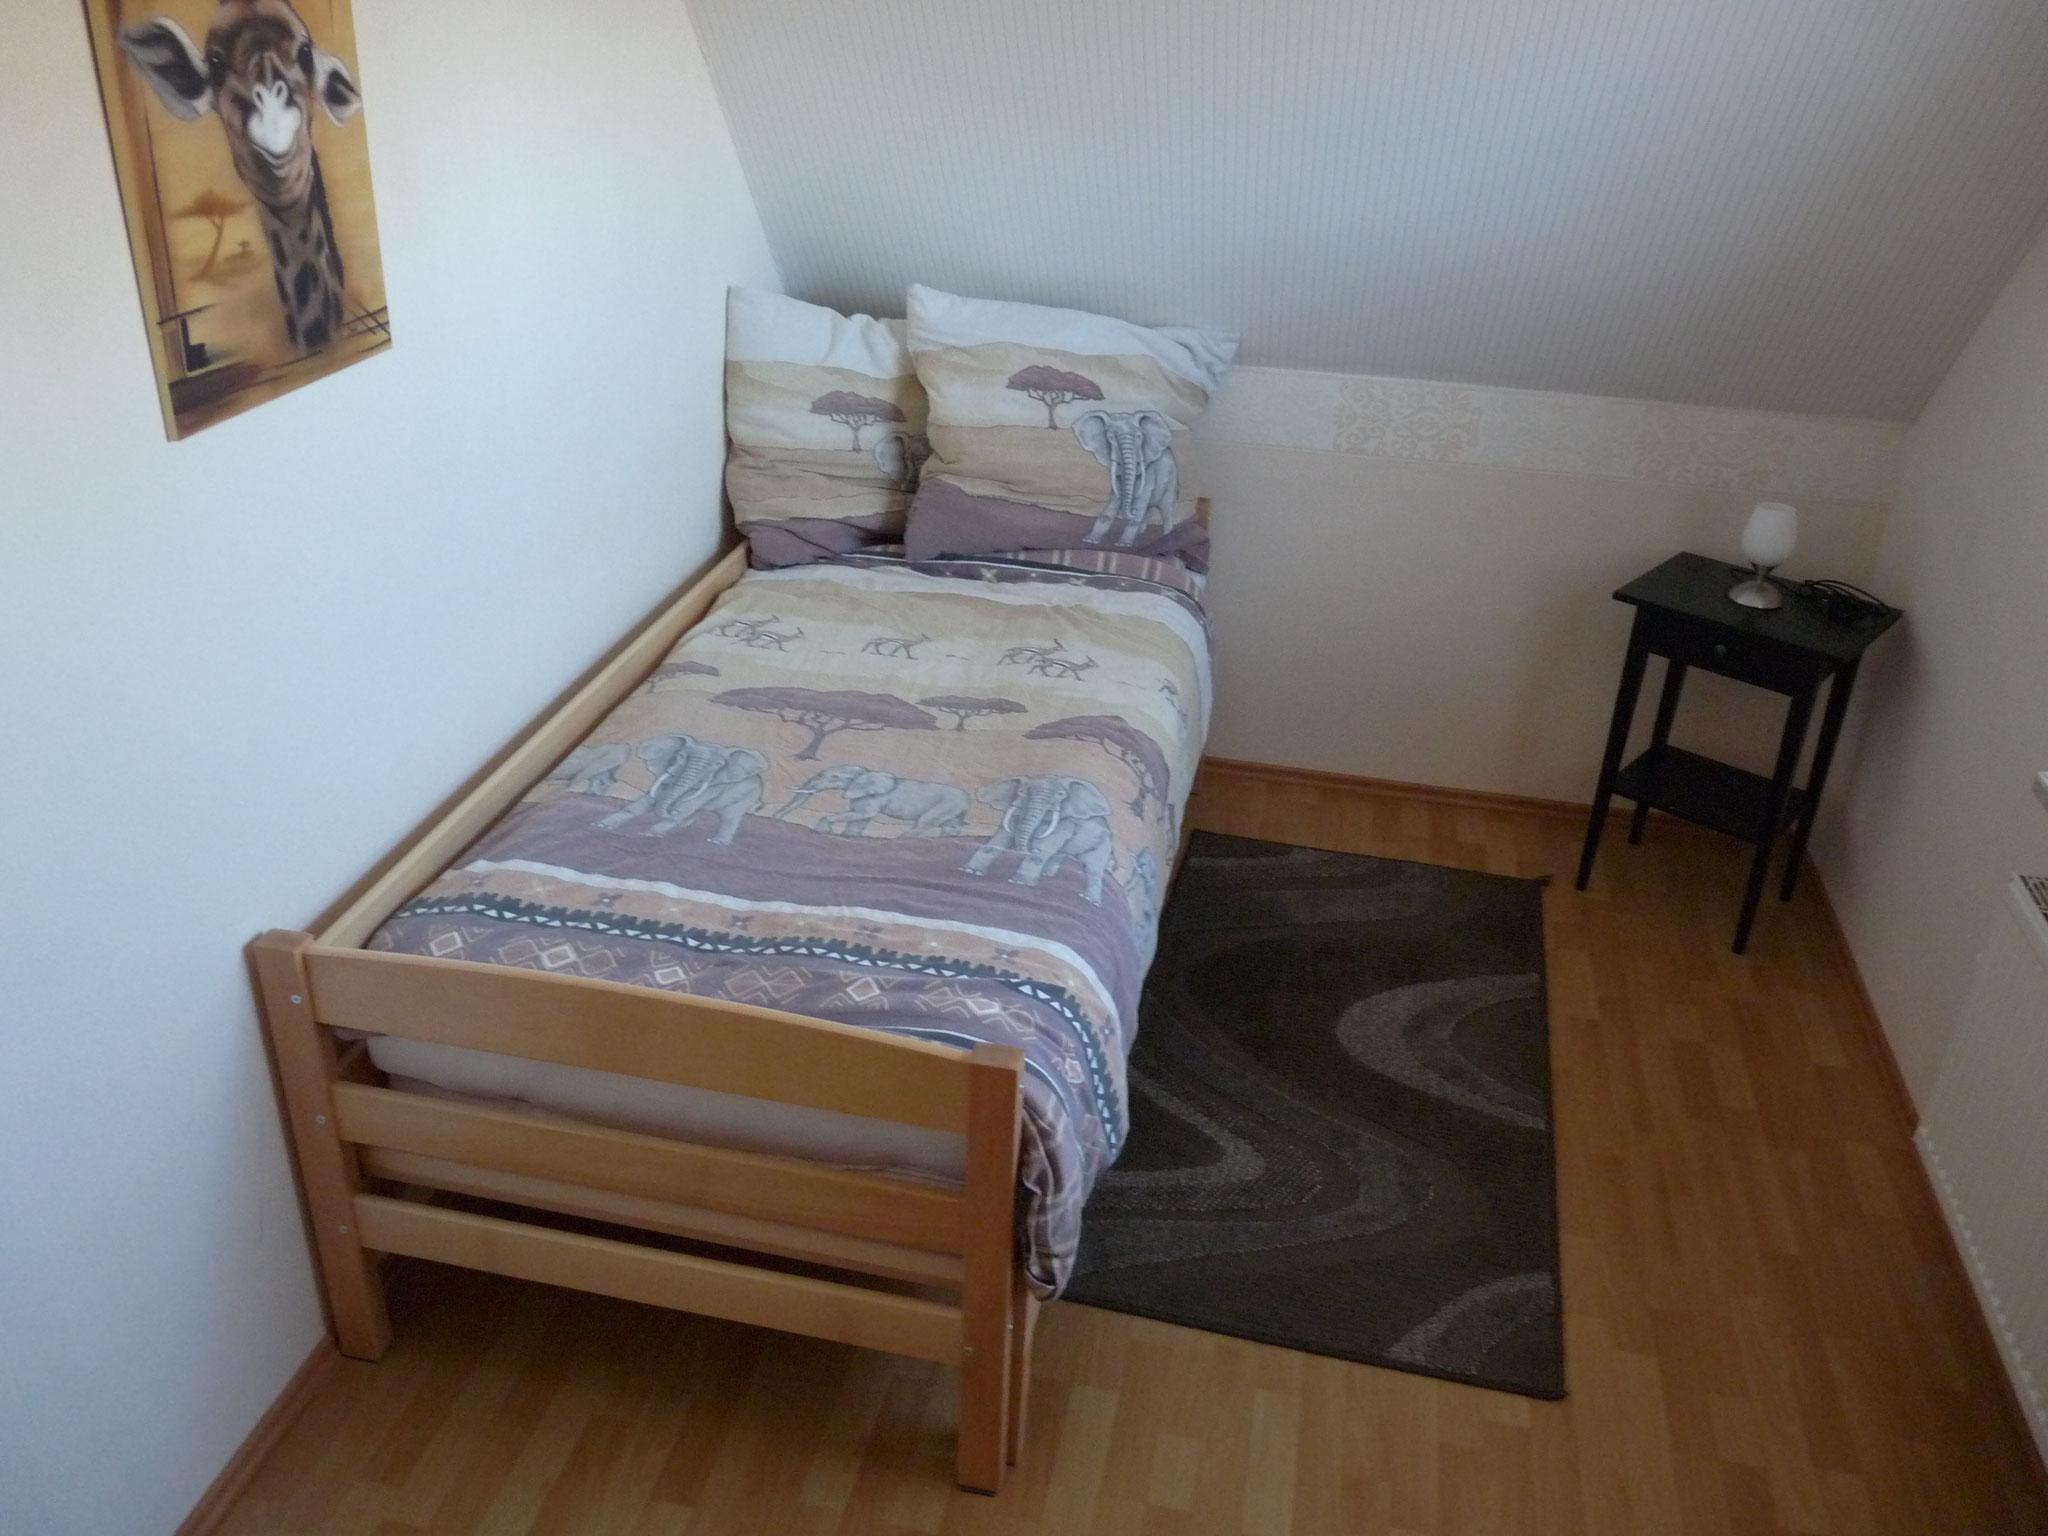 OG Schlafzimmer Nr. 2 mit 1 Bett (90cm x 200cm)